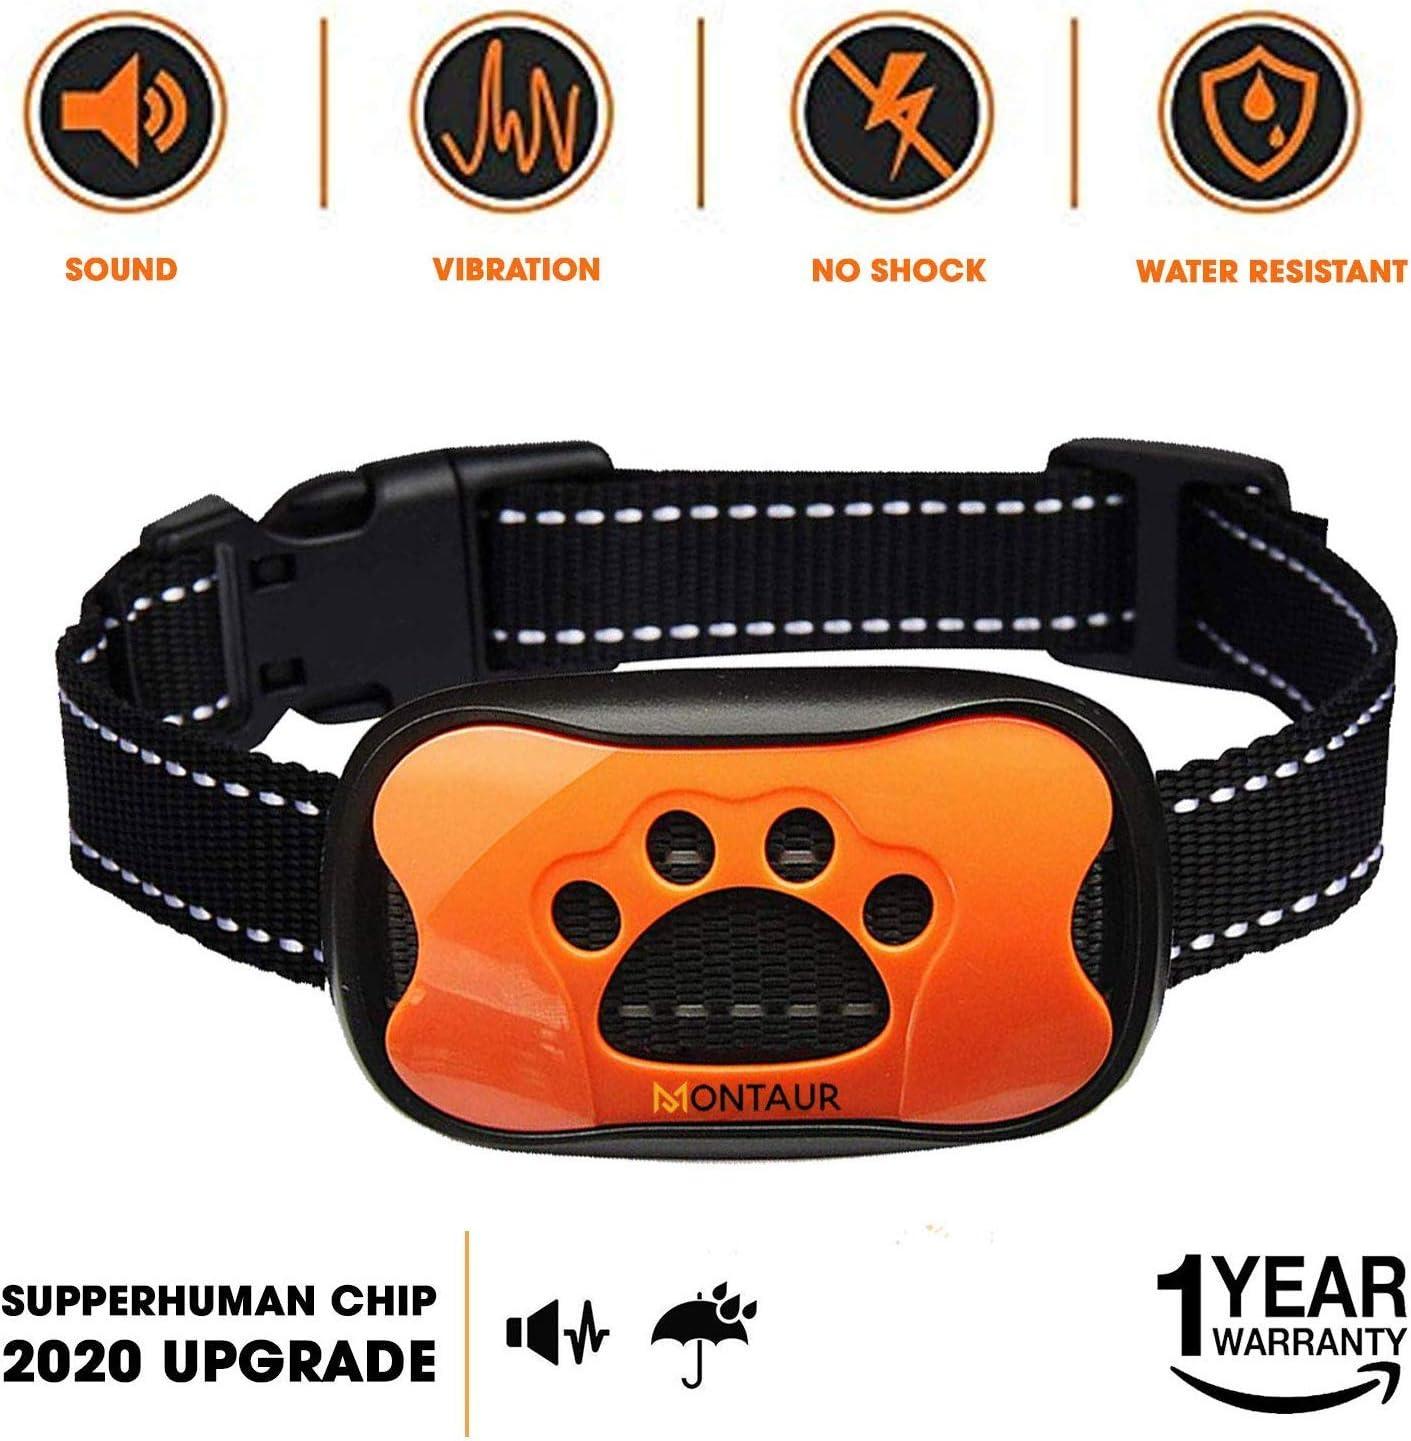 MONTAUR Dog Bark Collar – no Shock Vibration and Sound Stop Barking Collar for Dogs – 7 Level Sensitivities Anti Bark Collar